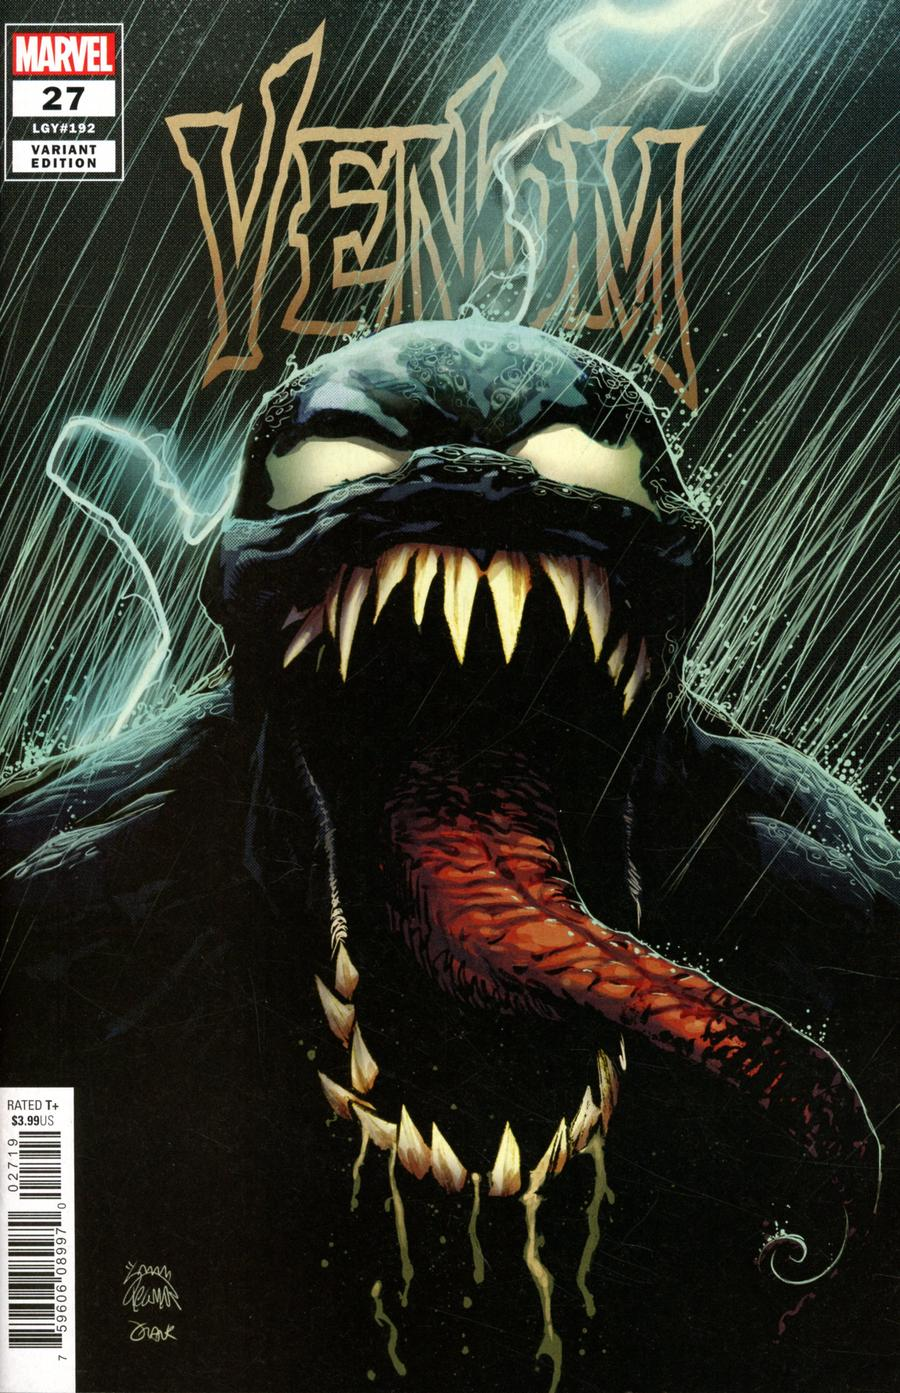 Venom Vol 4 #27 Cover B Variant Ryan Stegman Cover